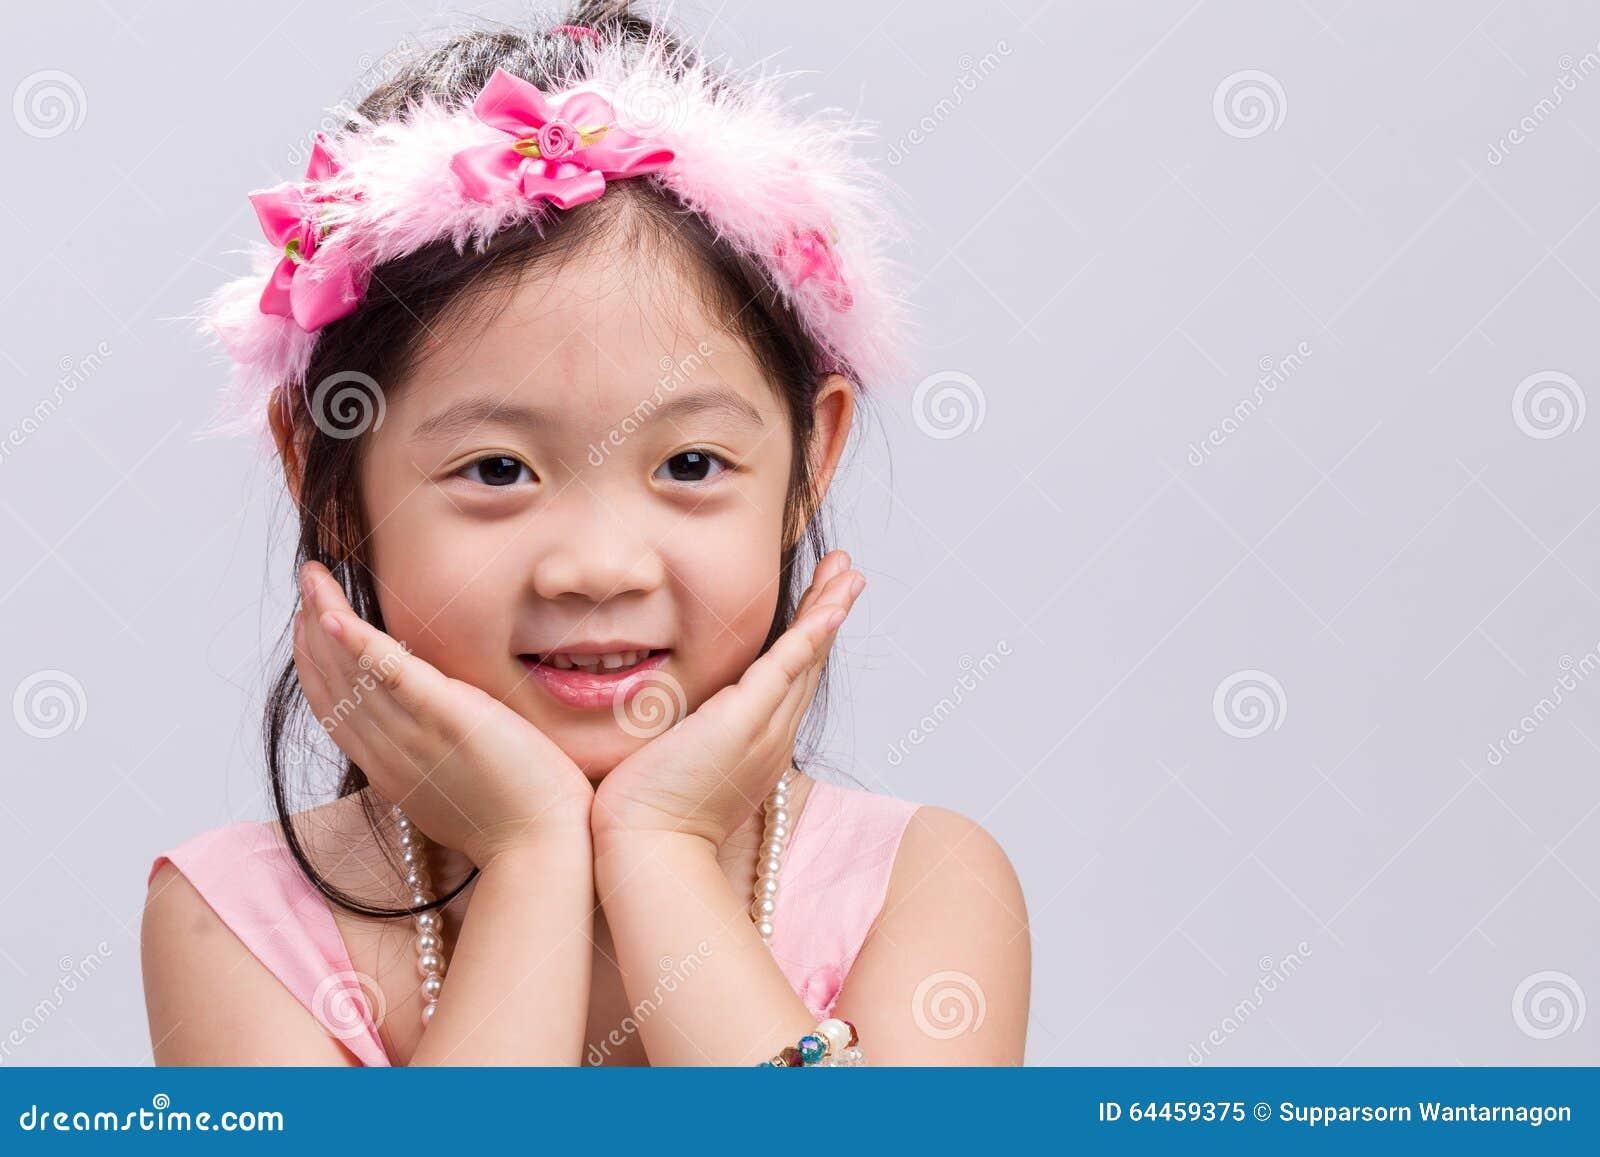 Kid With Flower Crown Stock Photo 64459375 Megapixl